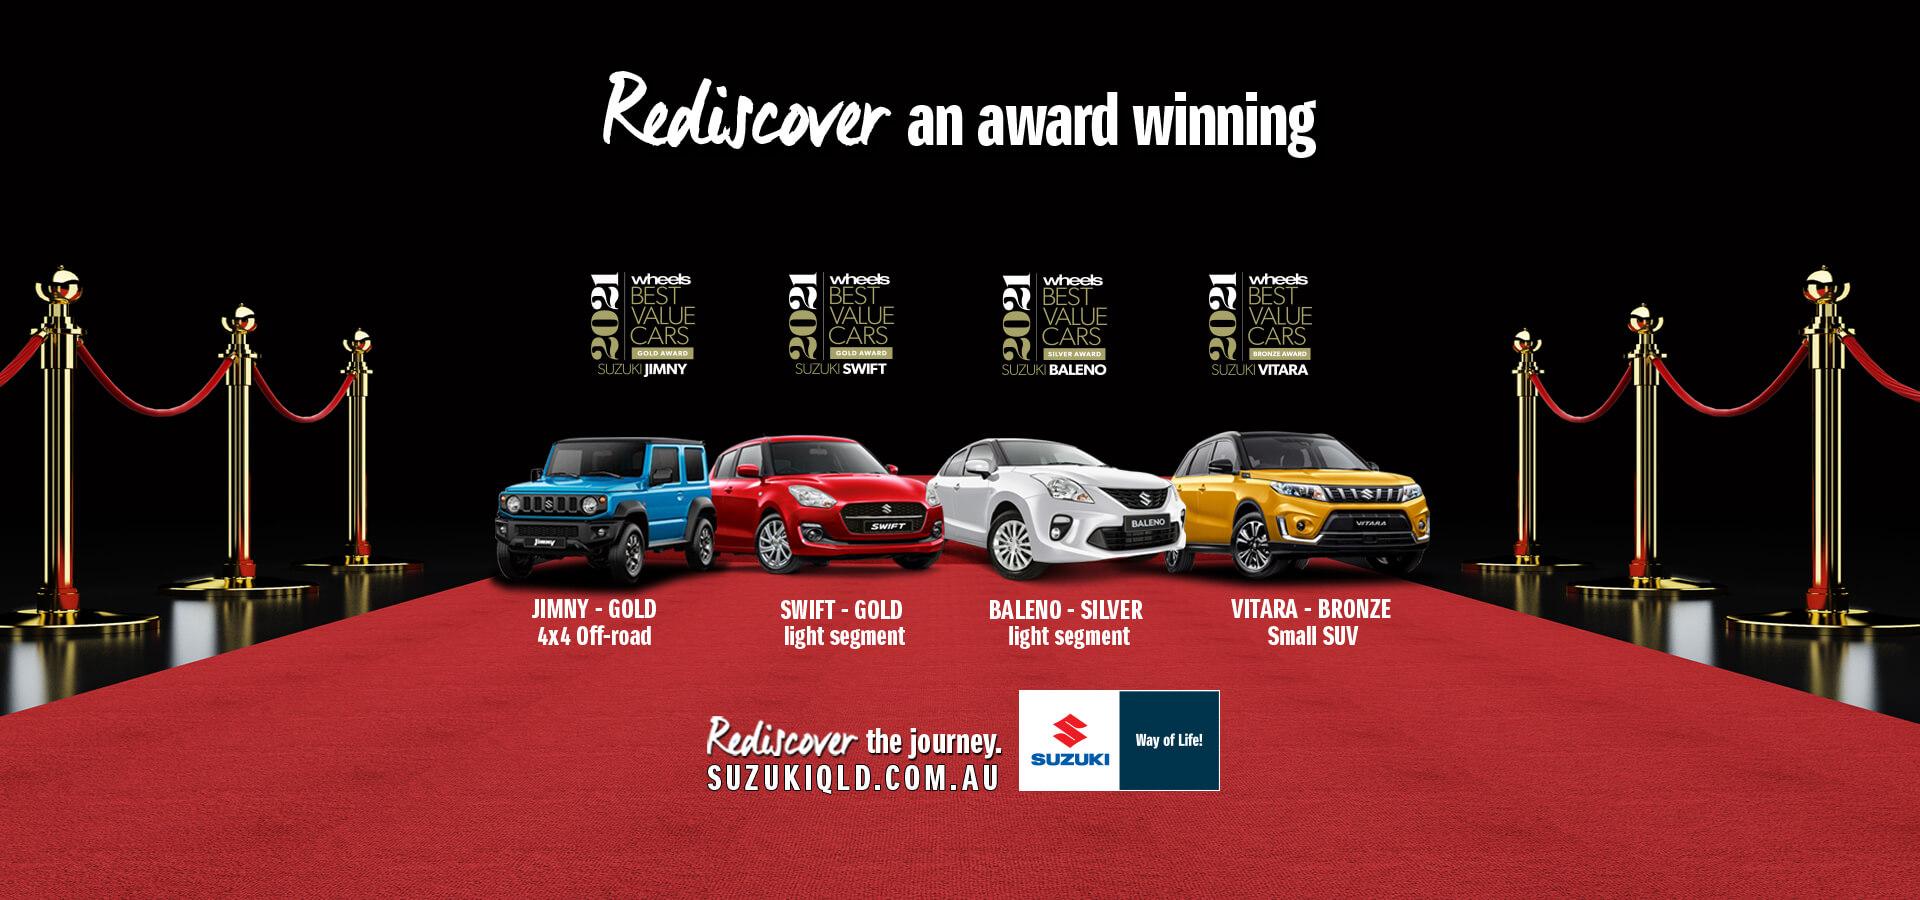 Rediscover an award winning range